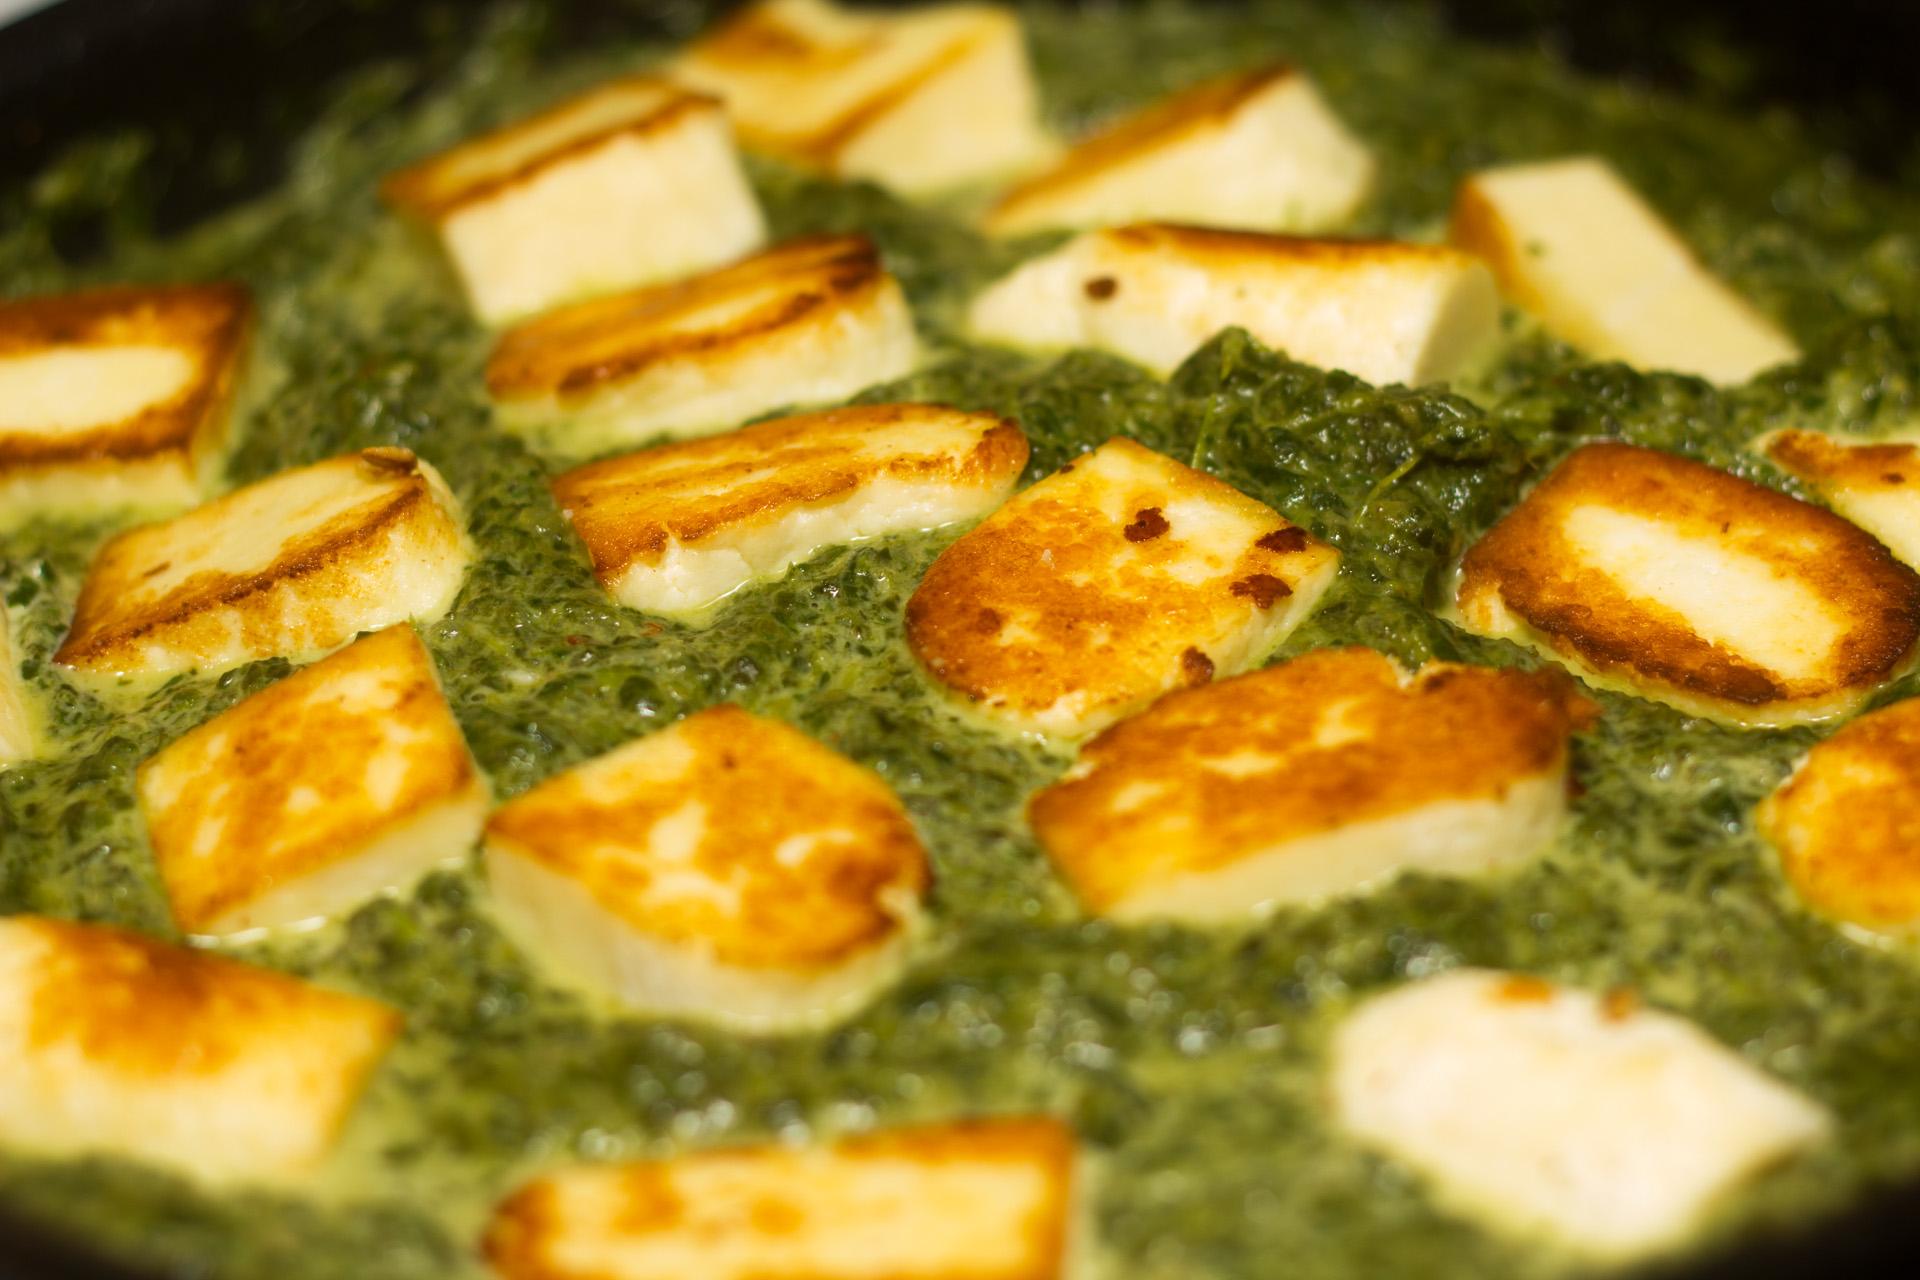 Indian Cuisine With Joyita: Palak Paneer